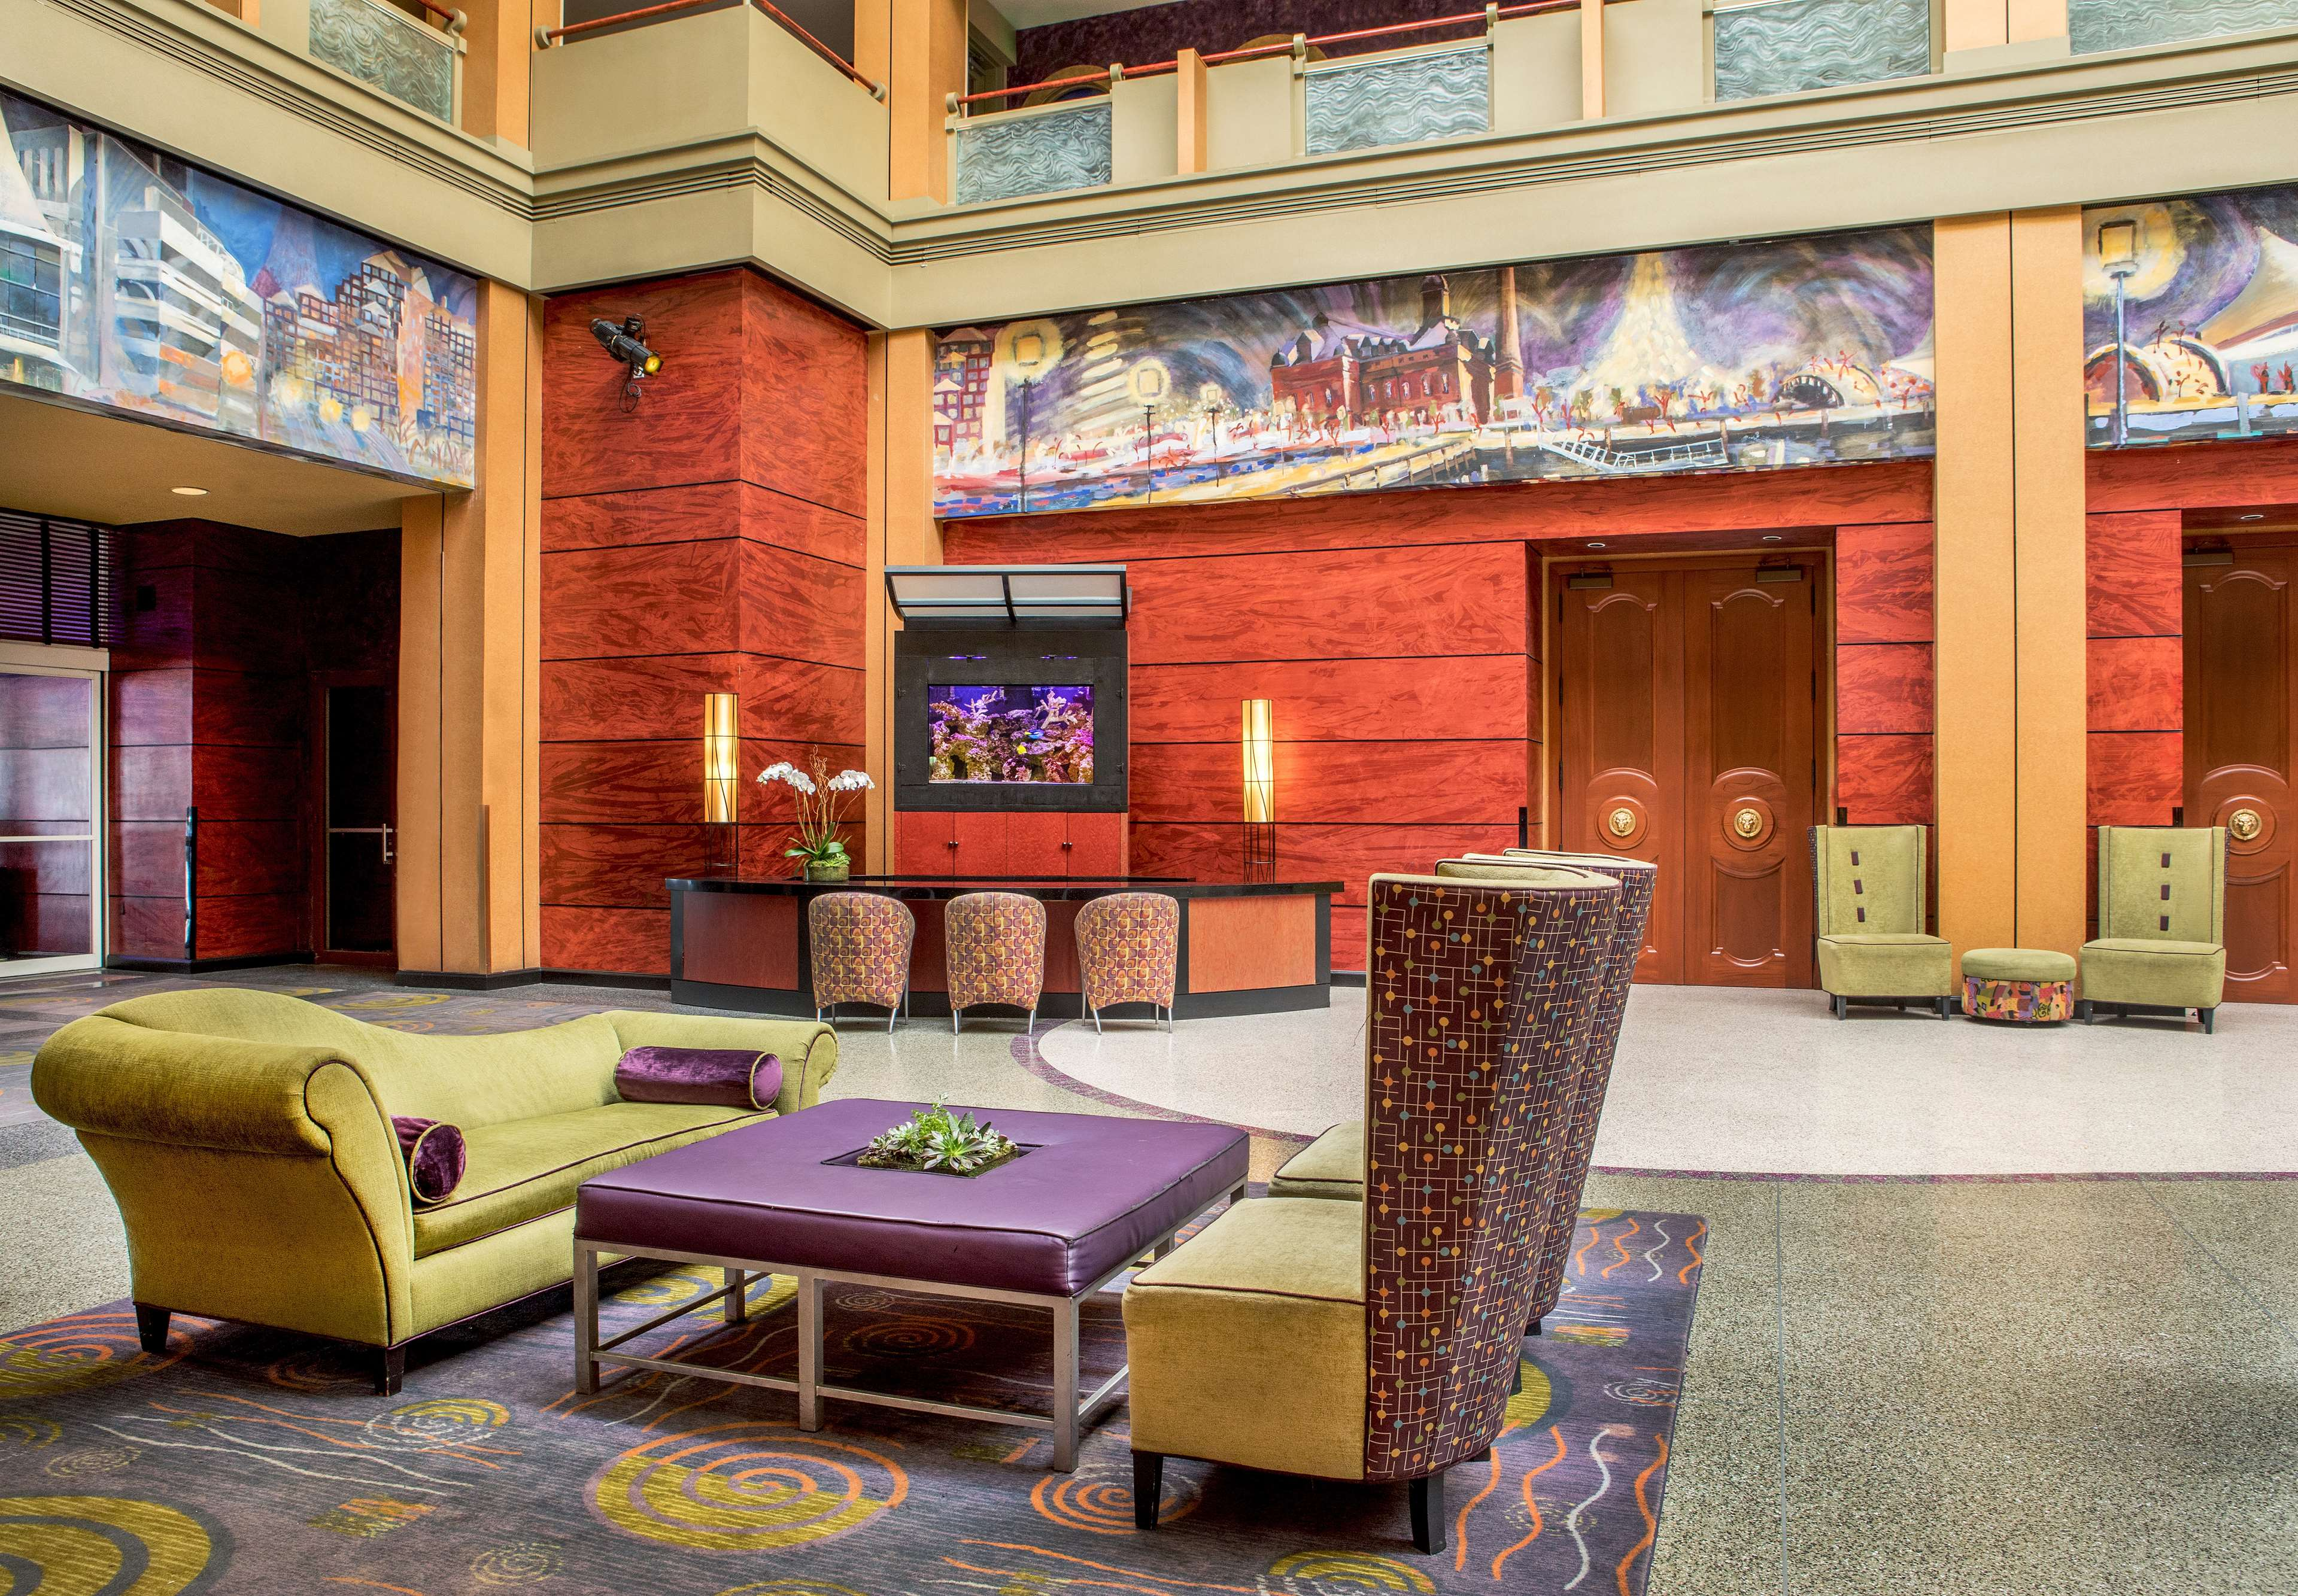 Pier 5 Hotel Baltimore, Curio Collection by Hilton image 4